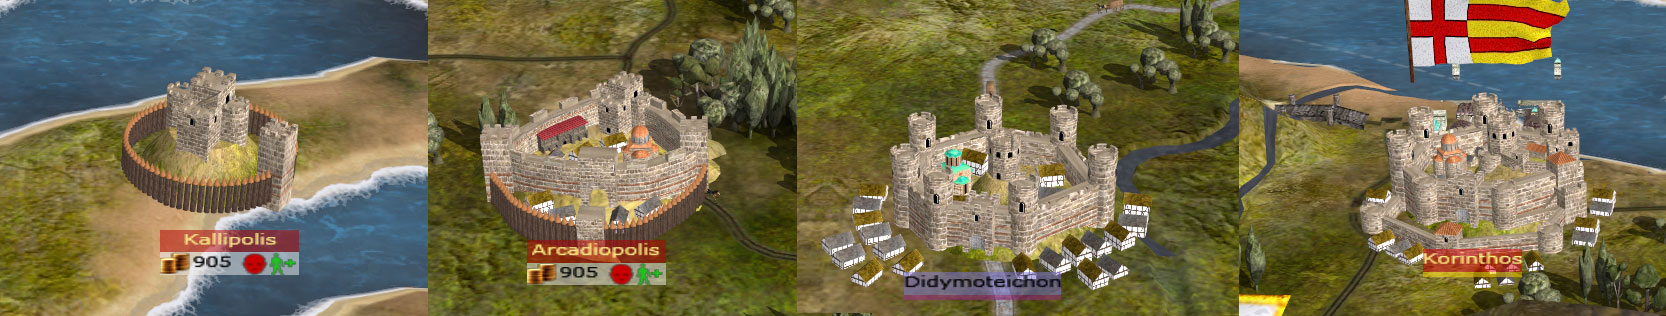 Capital City Auto >> New Strat Map Settlement Models feature - Tsardoms Total War mod for Medieval II: Total War ...